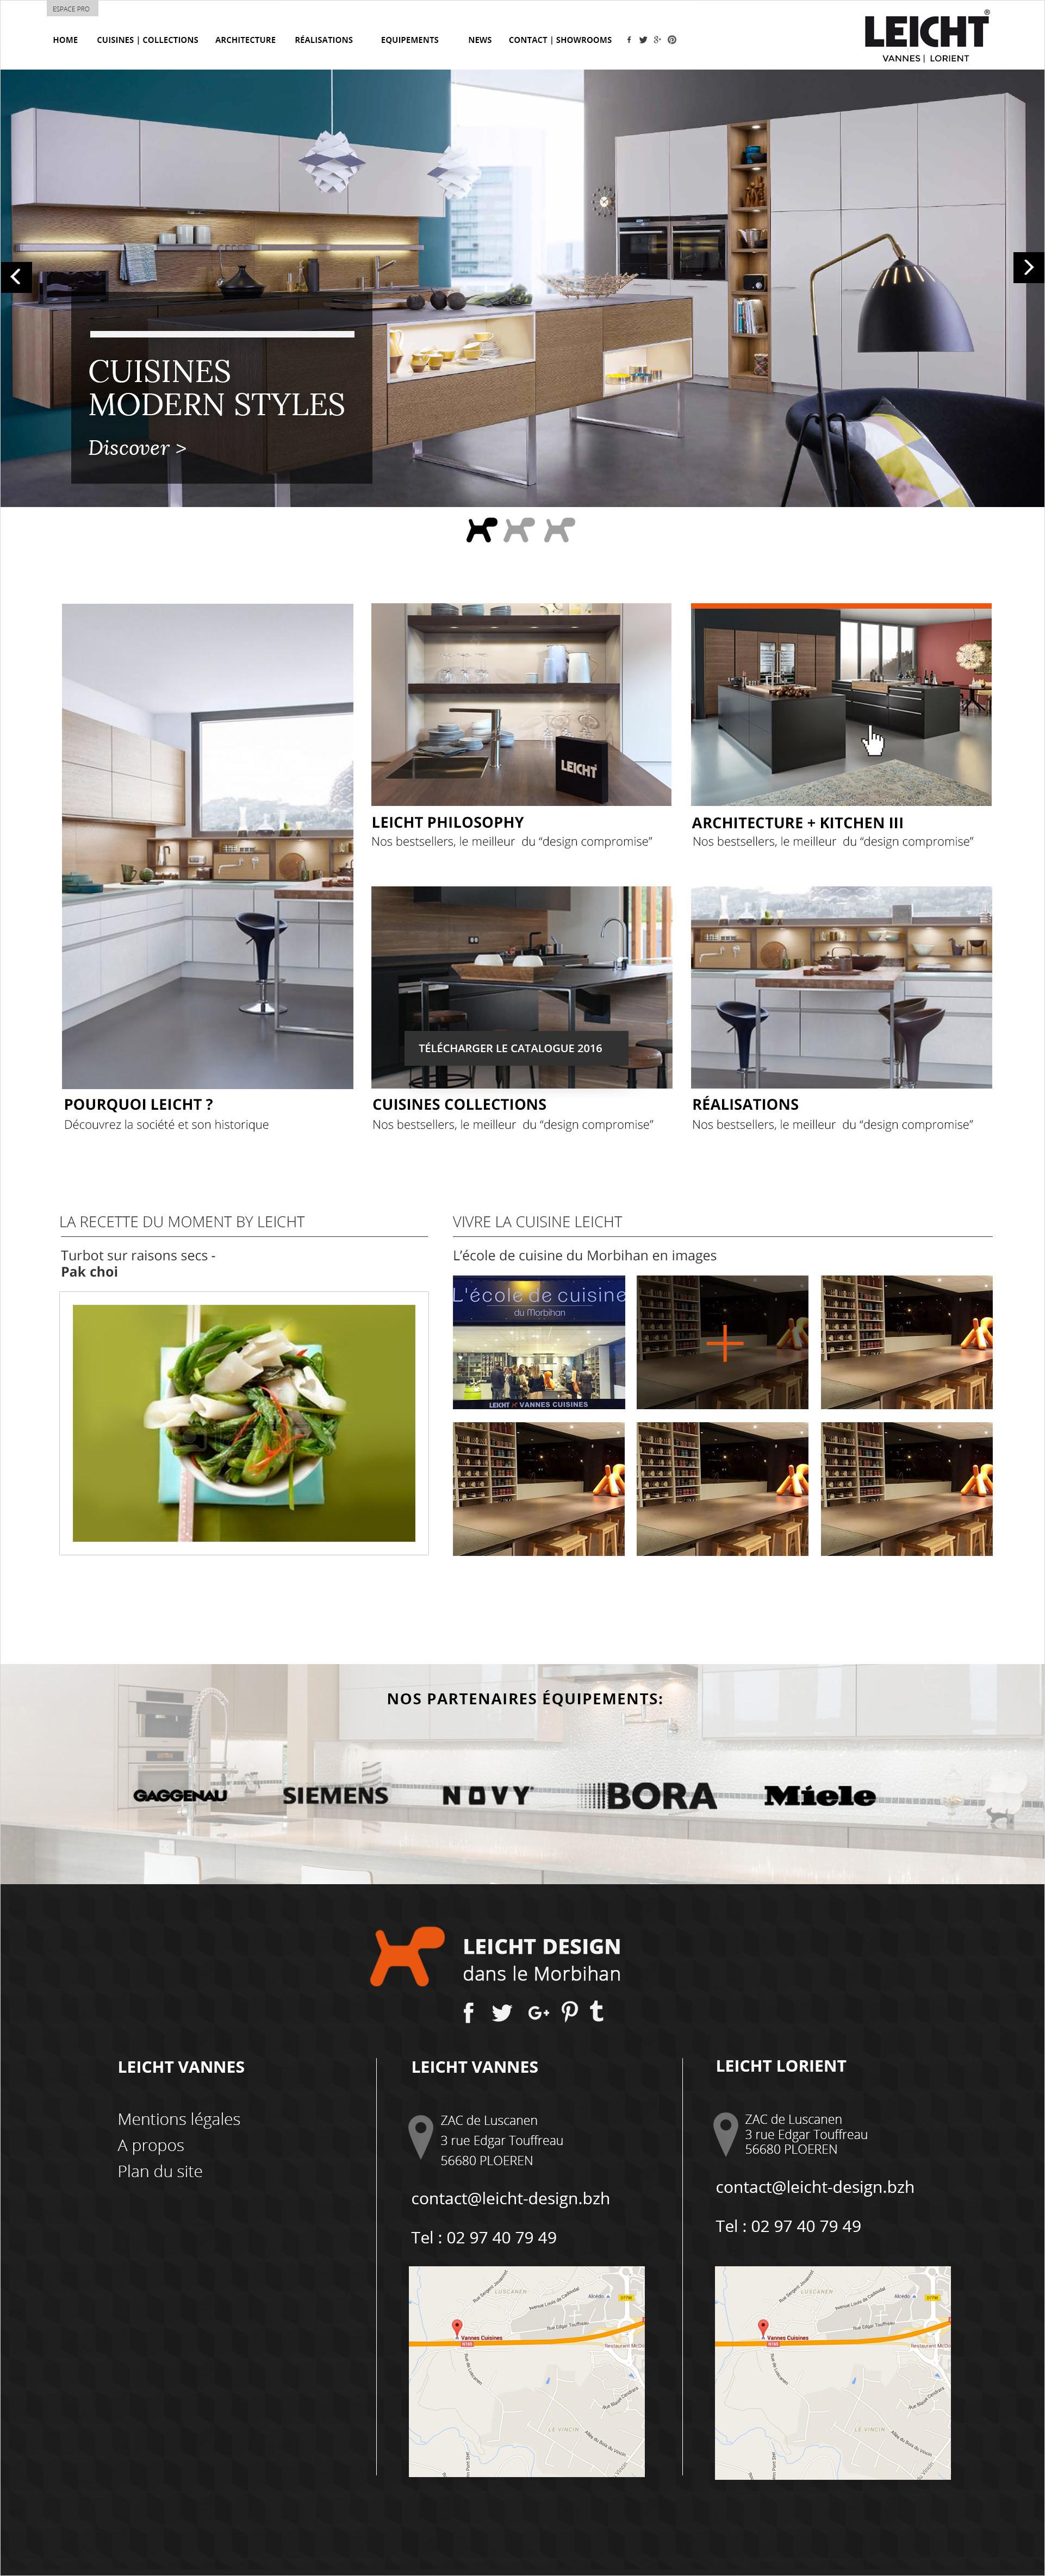 leicht-cuisines-maquette-vannes-studio-graphisme-bretagne